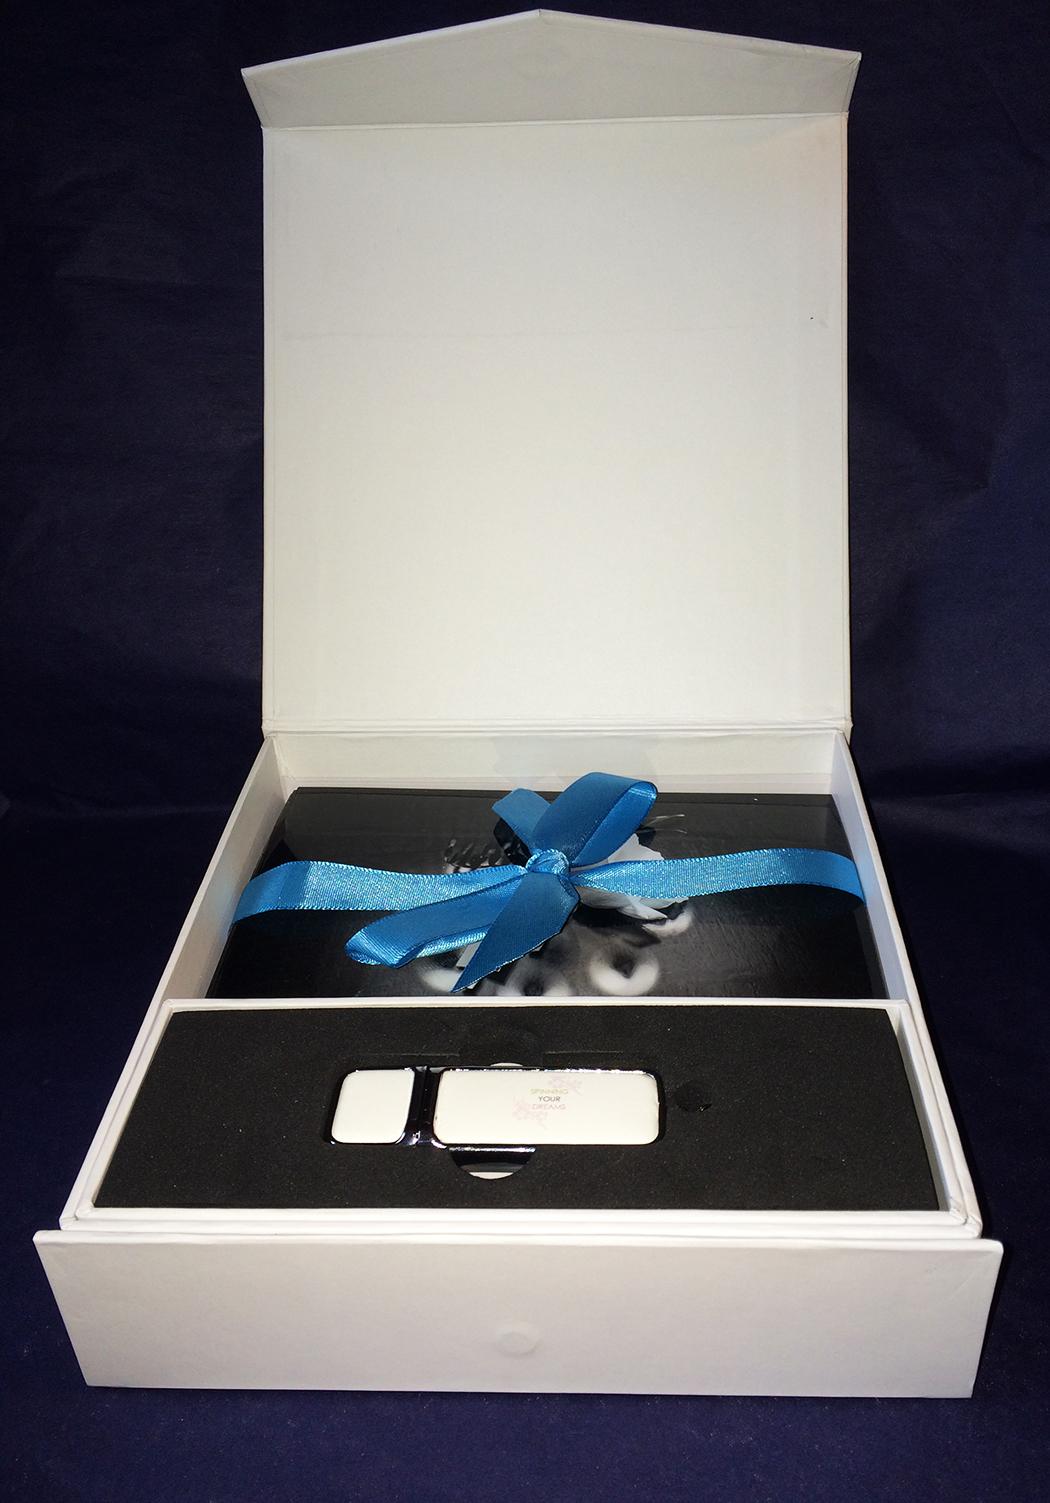 photo box with USB stick